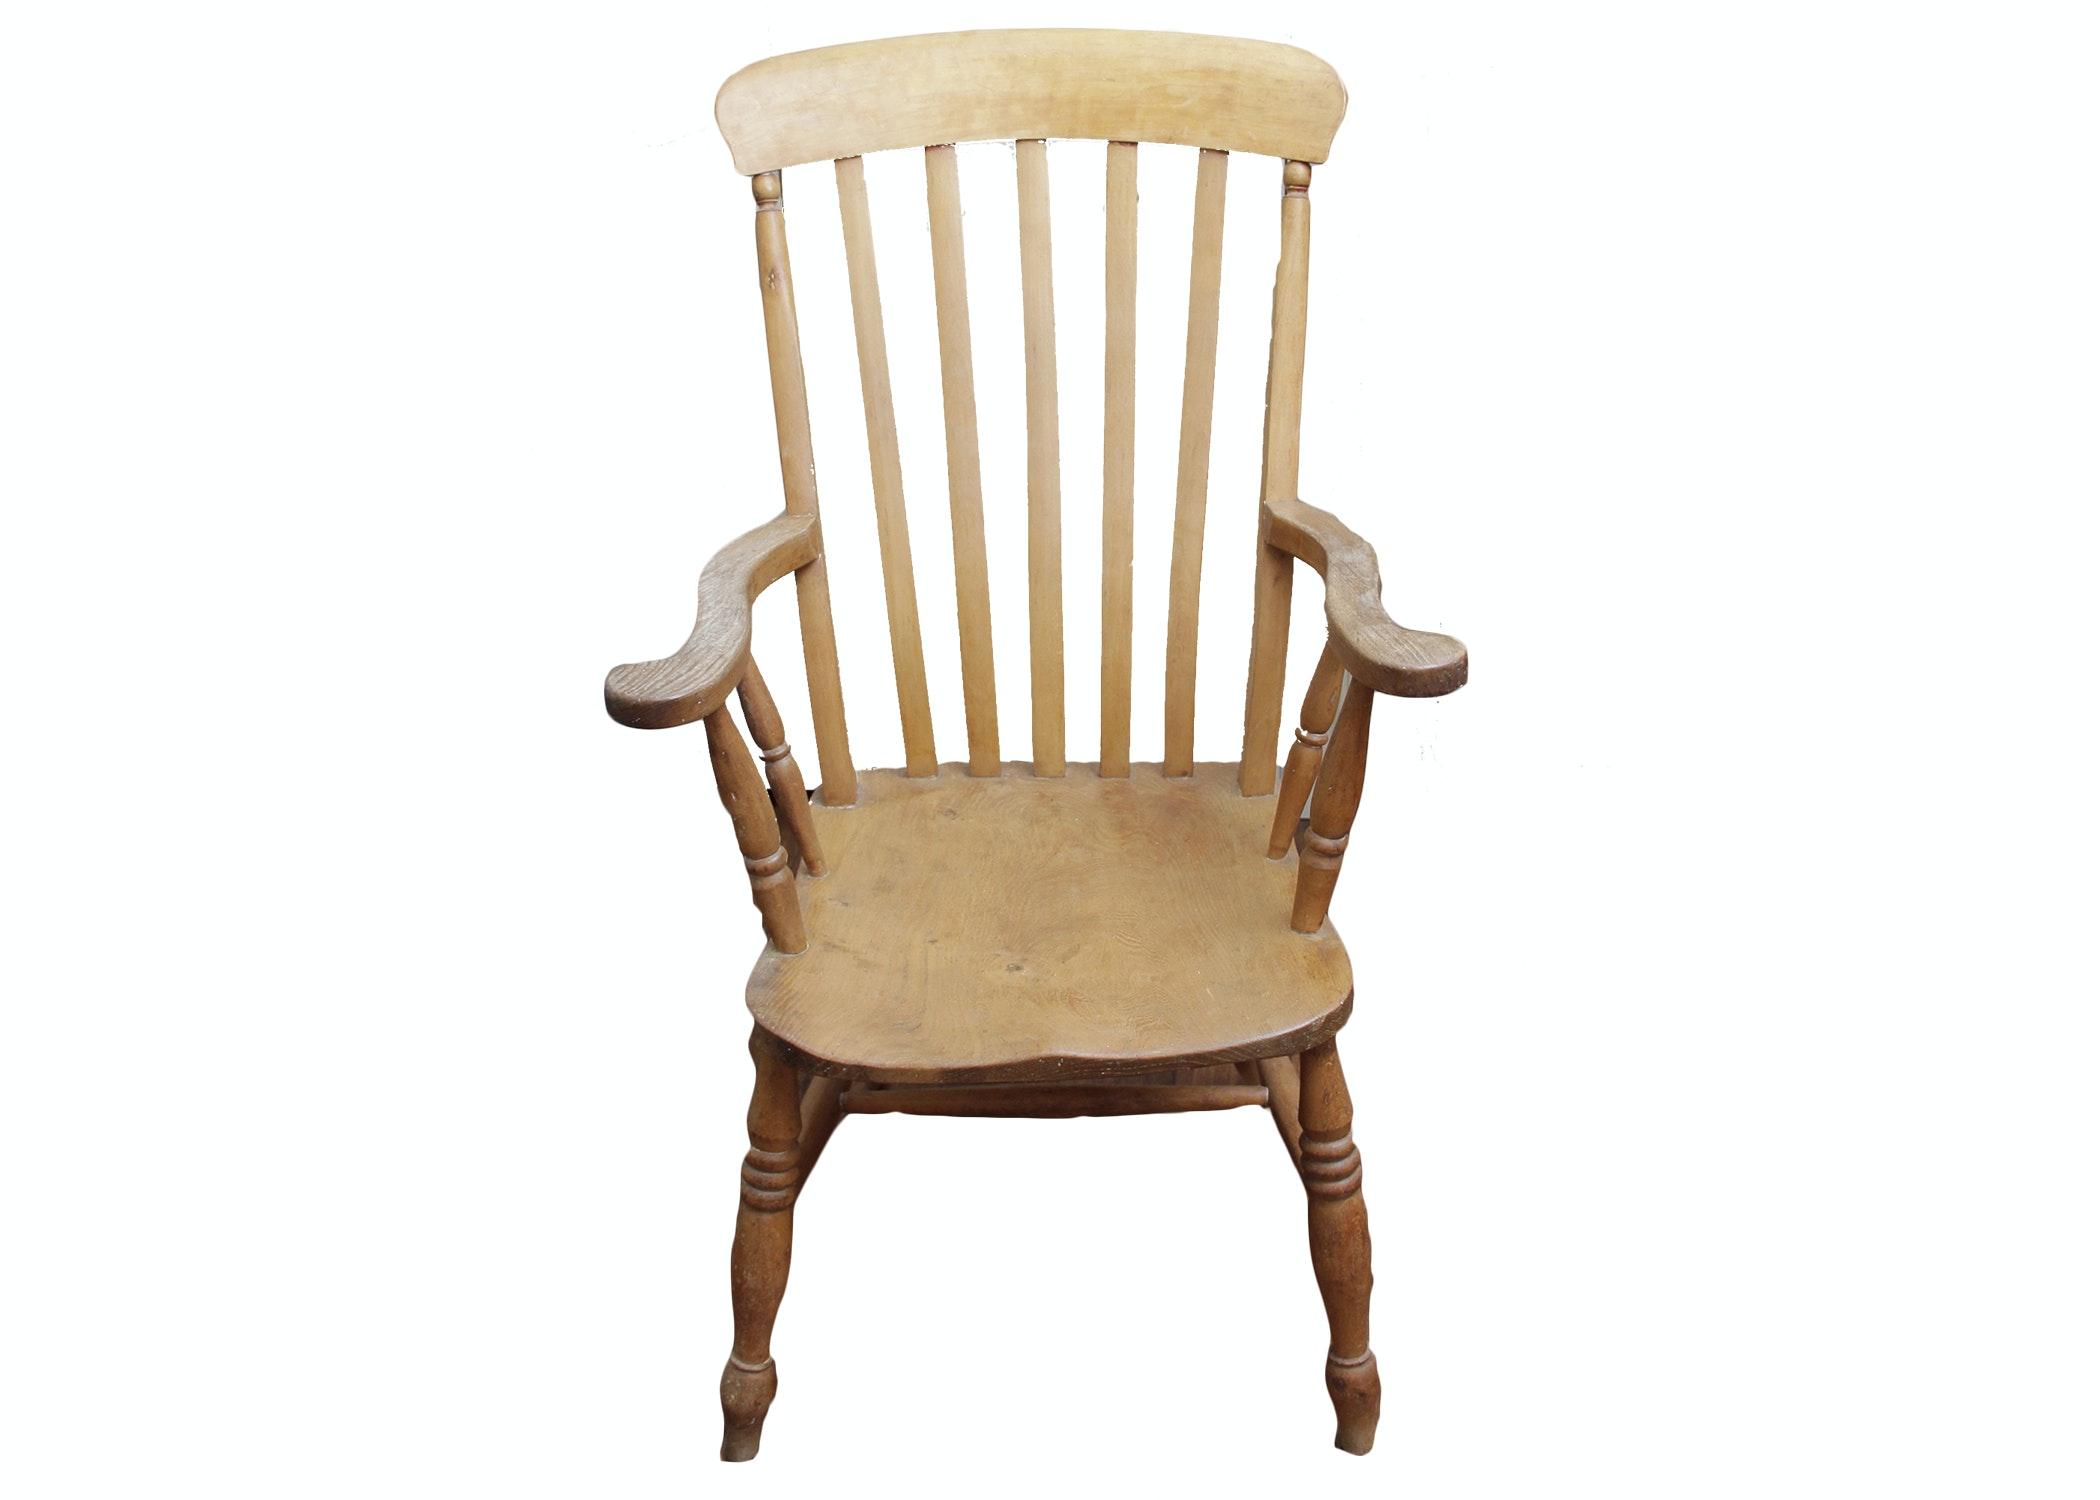 Maple High Back Captains Chair EBTH : 15DAL029Sep0820152900jpgixlibrb 11 from ebth.com size 1400 x 1000 jpeg 85kB